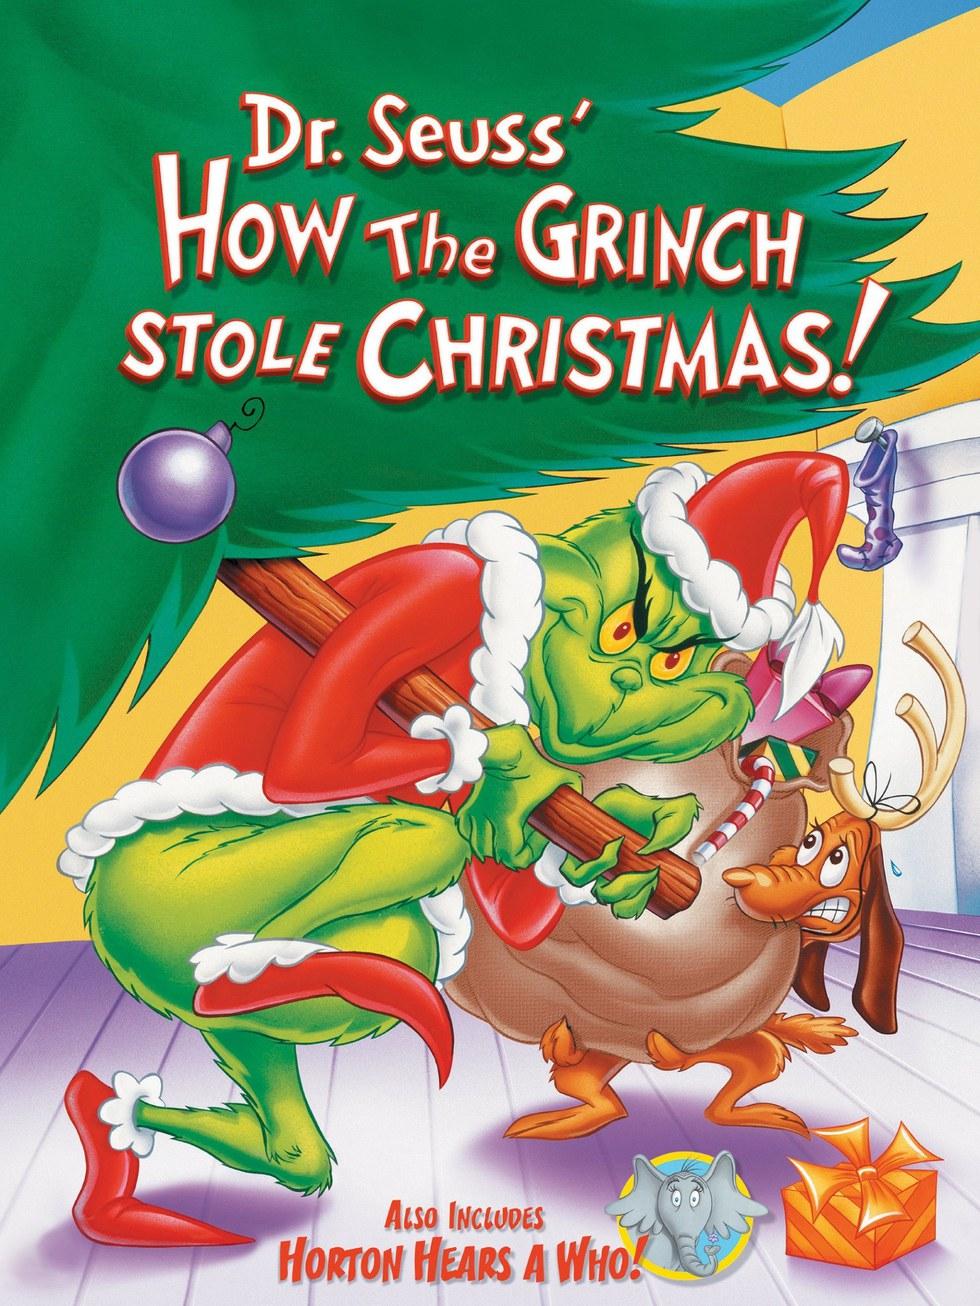 20 Chrismtas Movies To Spark Your Christmas Spirit-9833